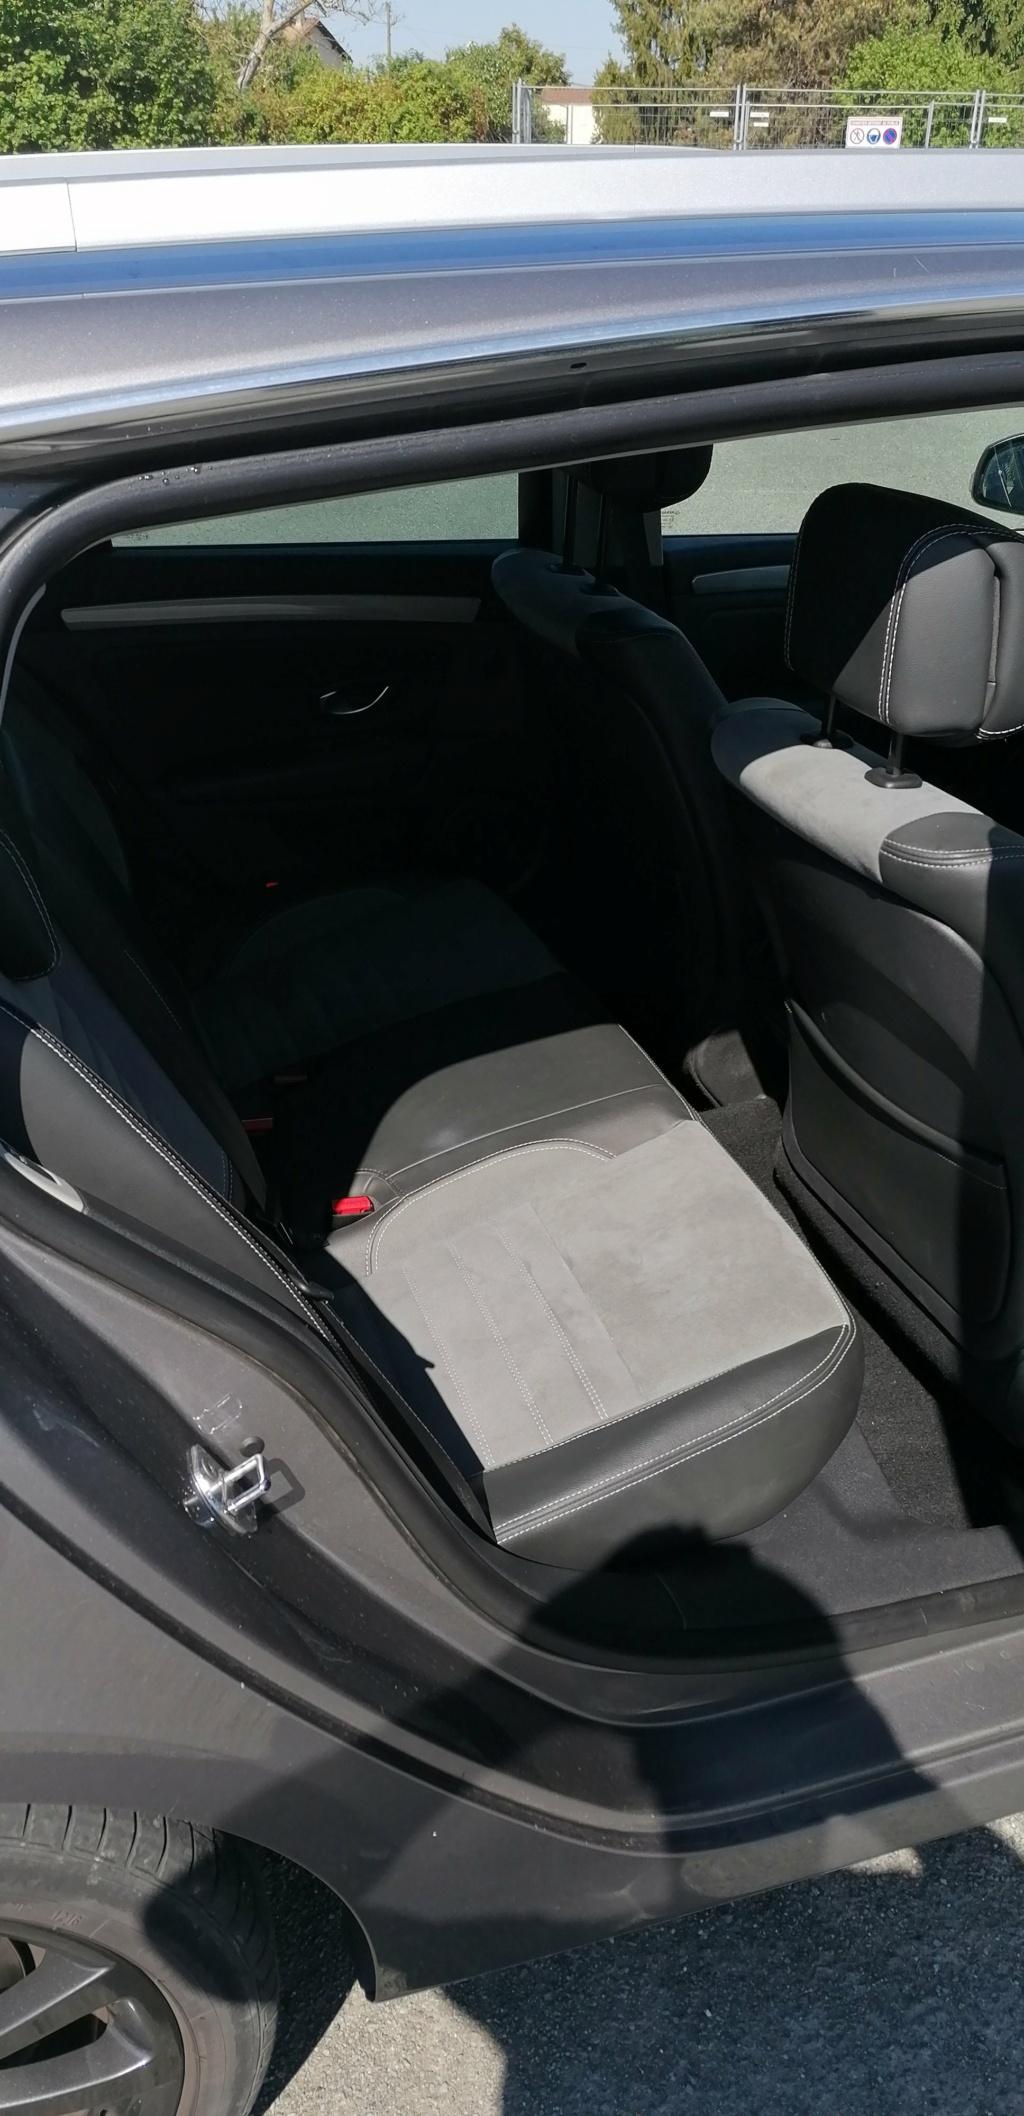 [Zef] Laguna III.2 GT 4control Estate BVA 2.0 dci 175 D6c41510